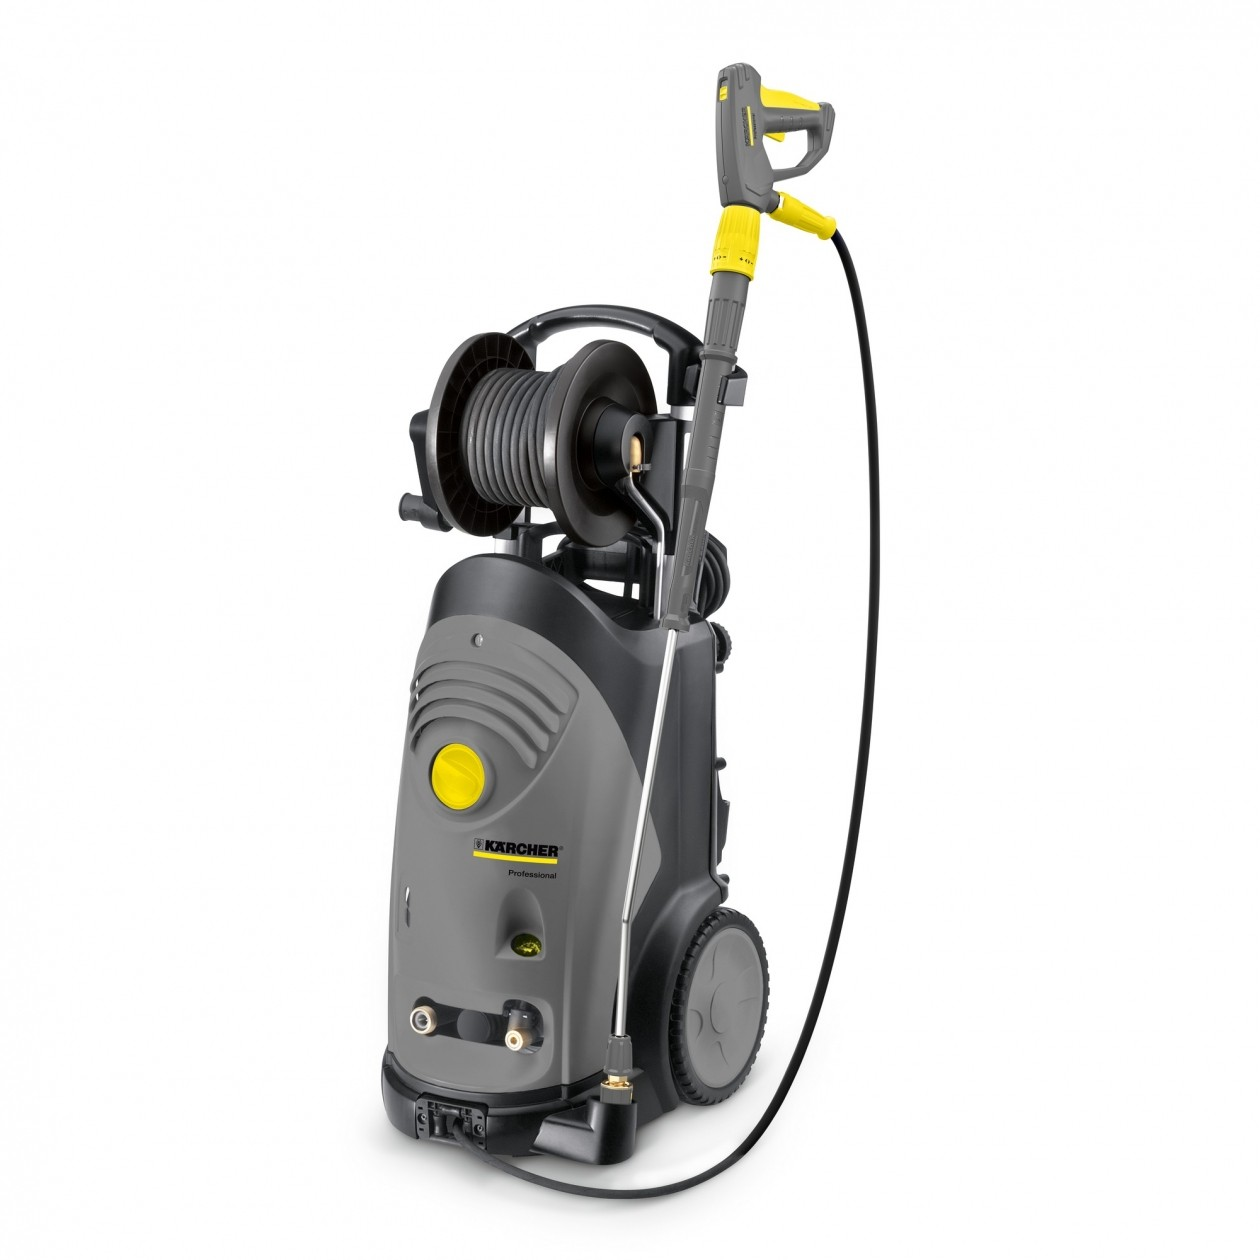 Karcher Hd 9 20 4 Mx Plus Pressure Clean